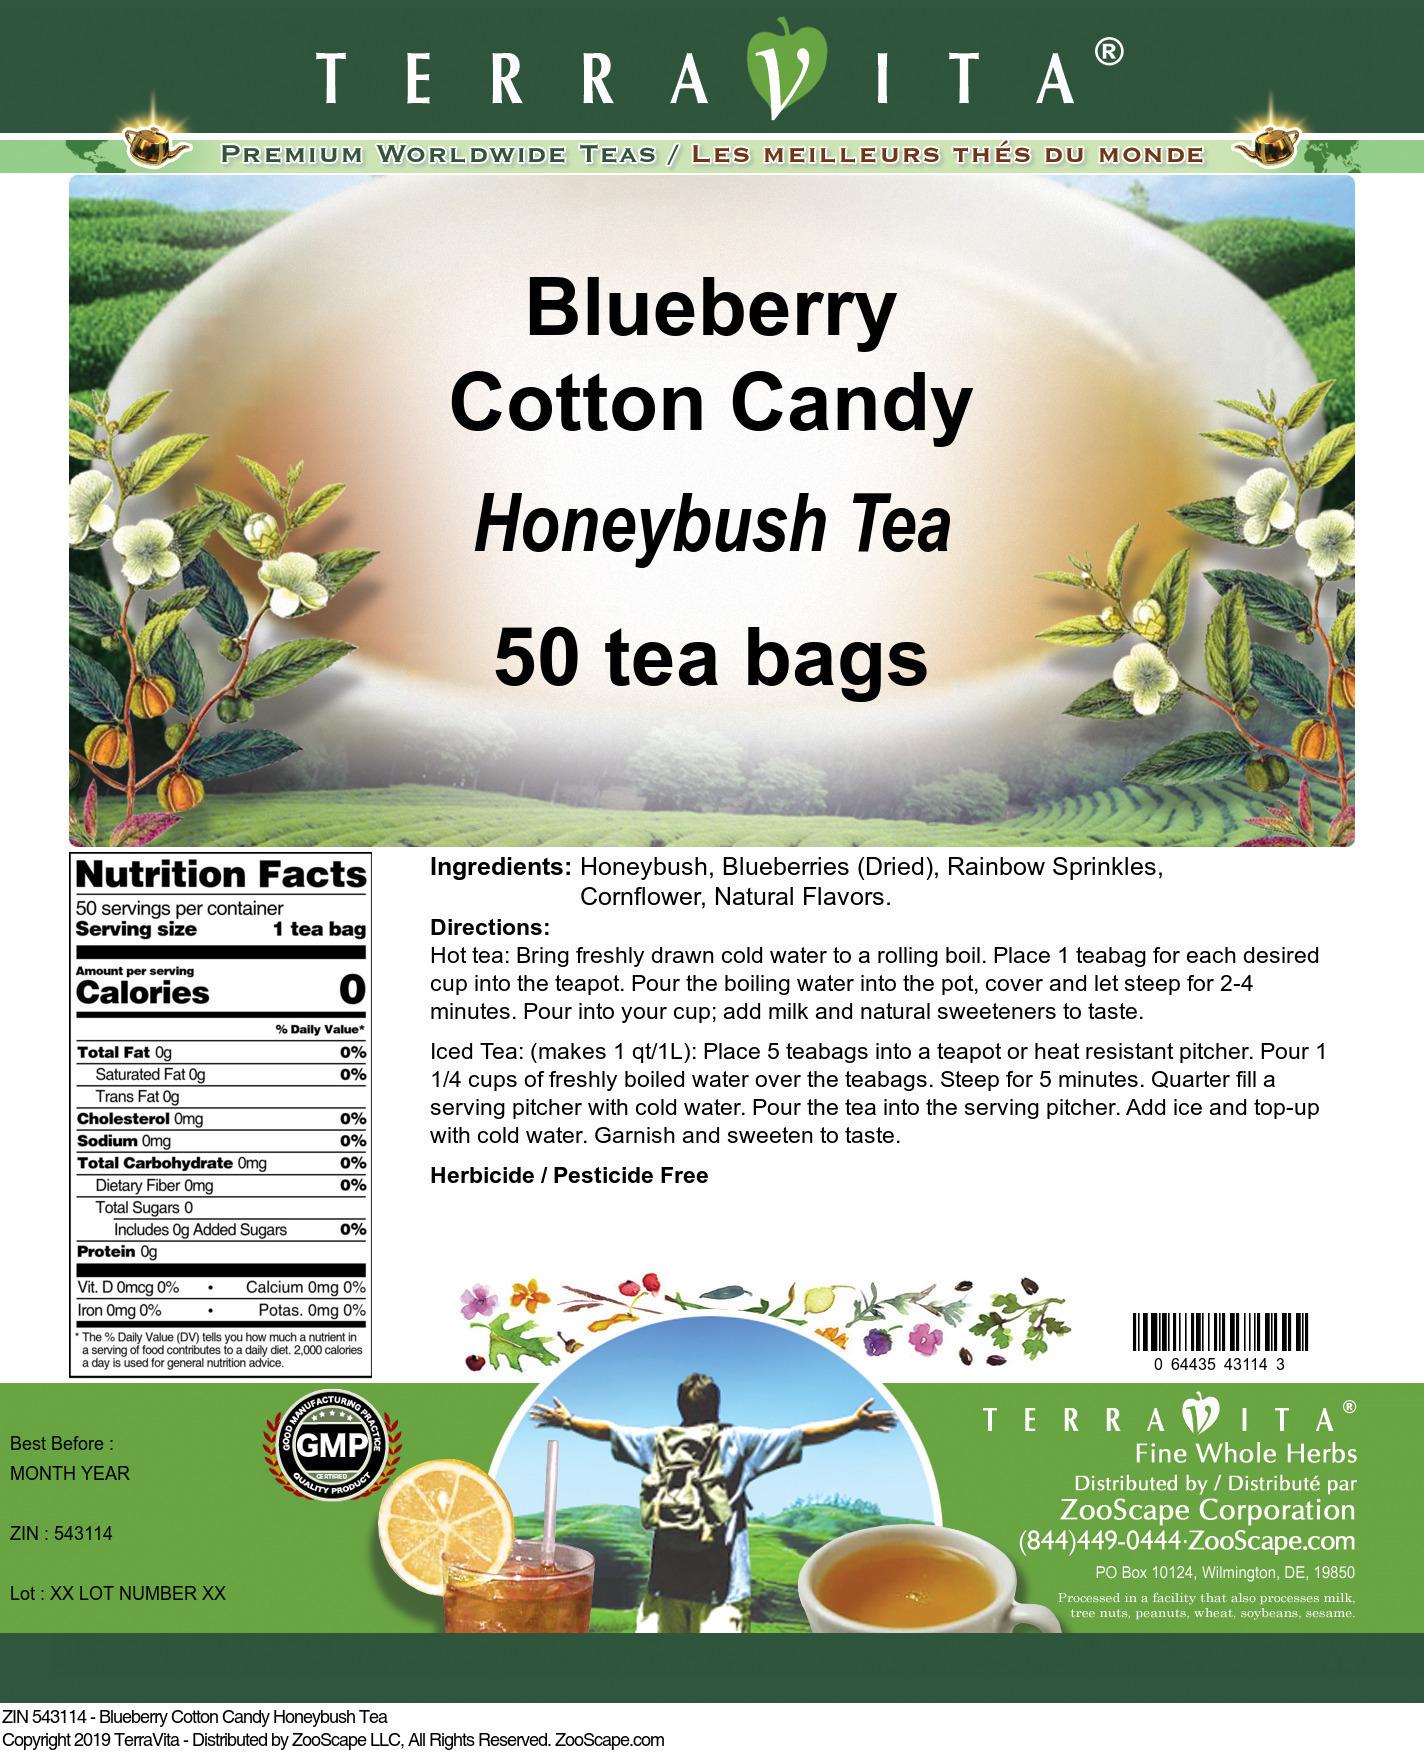 Blueberry Cotton Candy Honeybush Tea